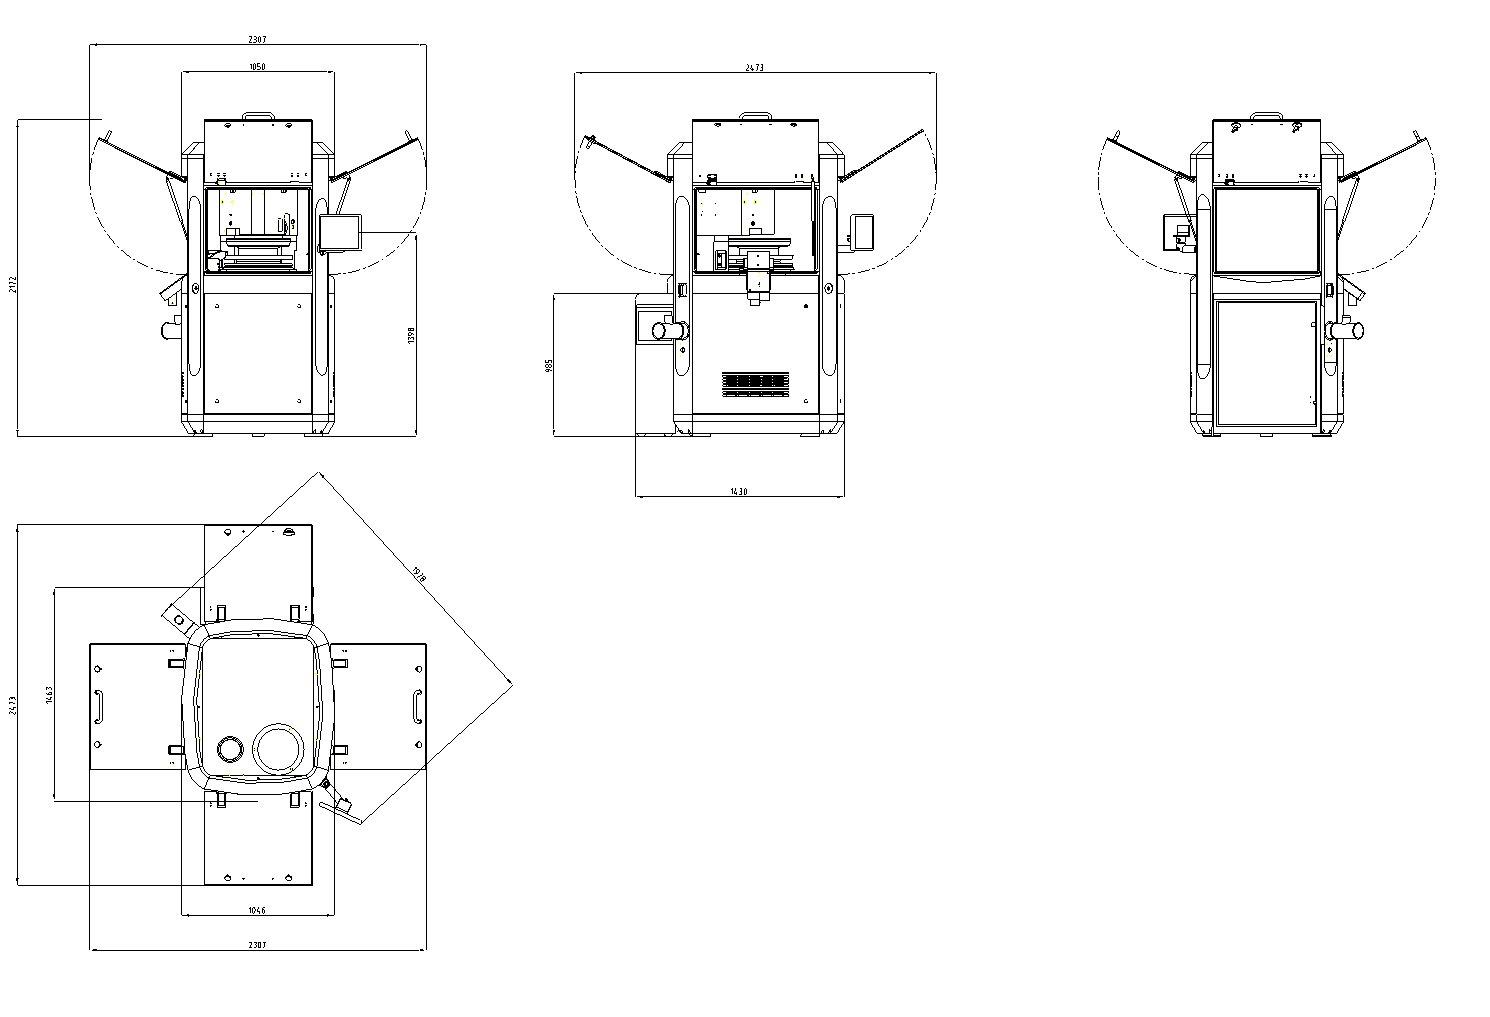 smart s-tablet press dimensions